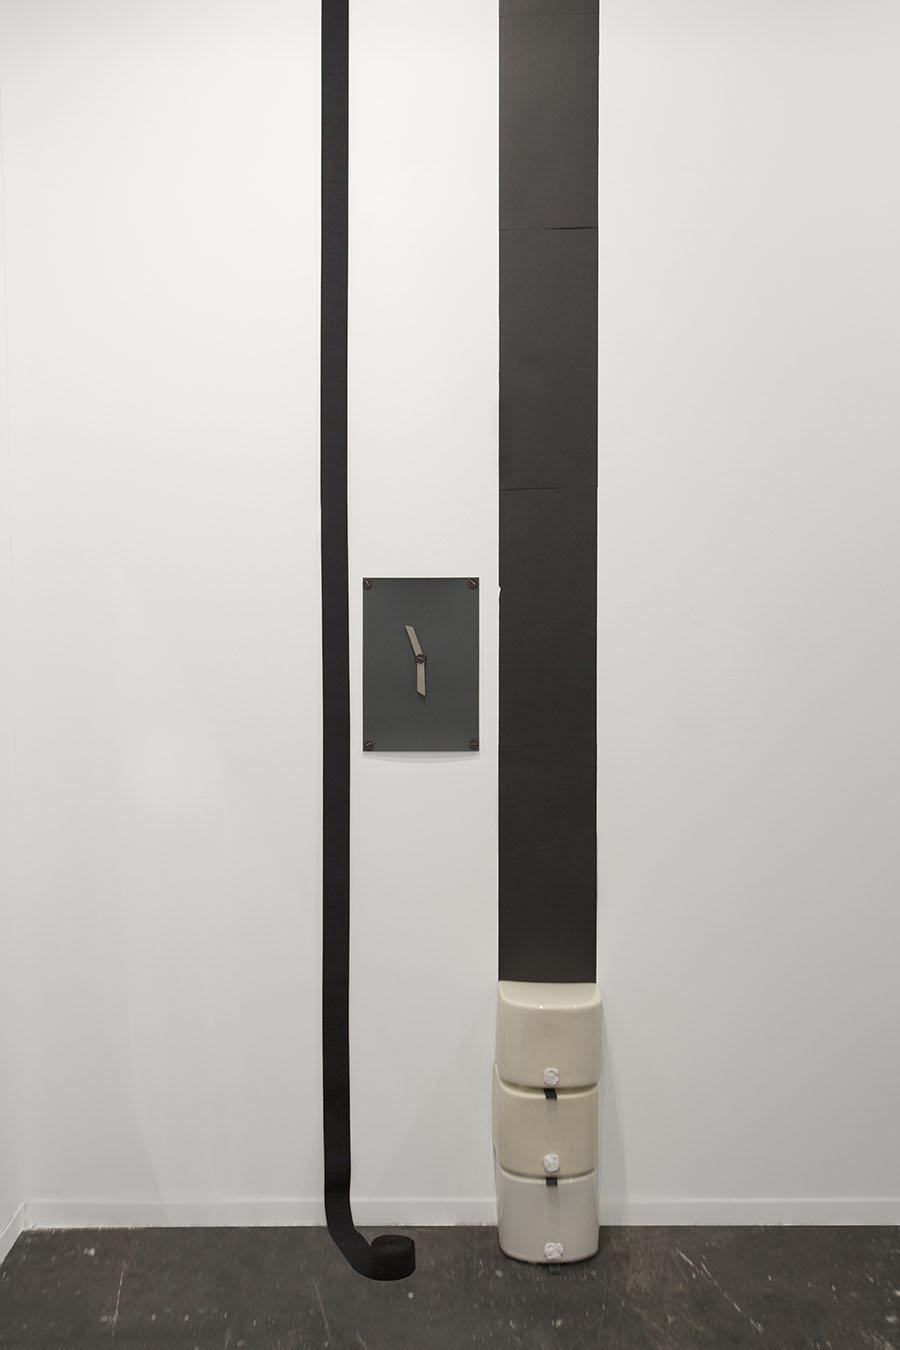 Arco 2019, Galeria Joan Prats